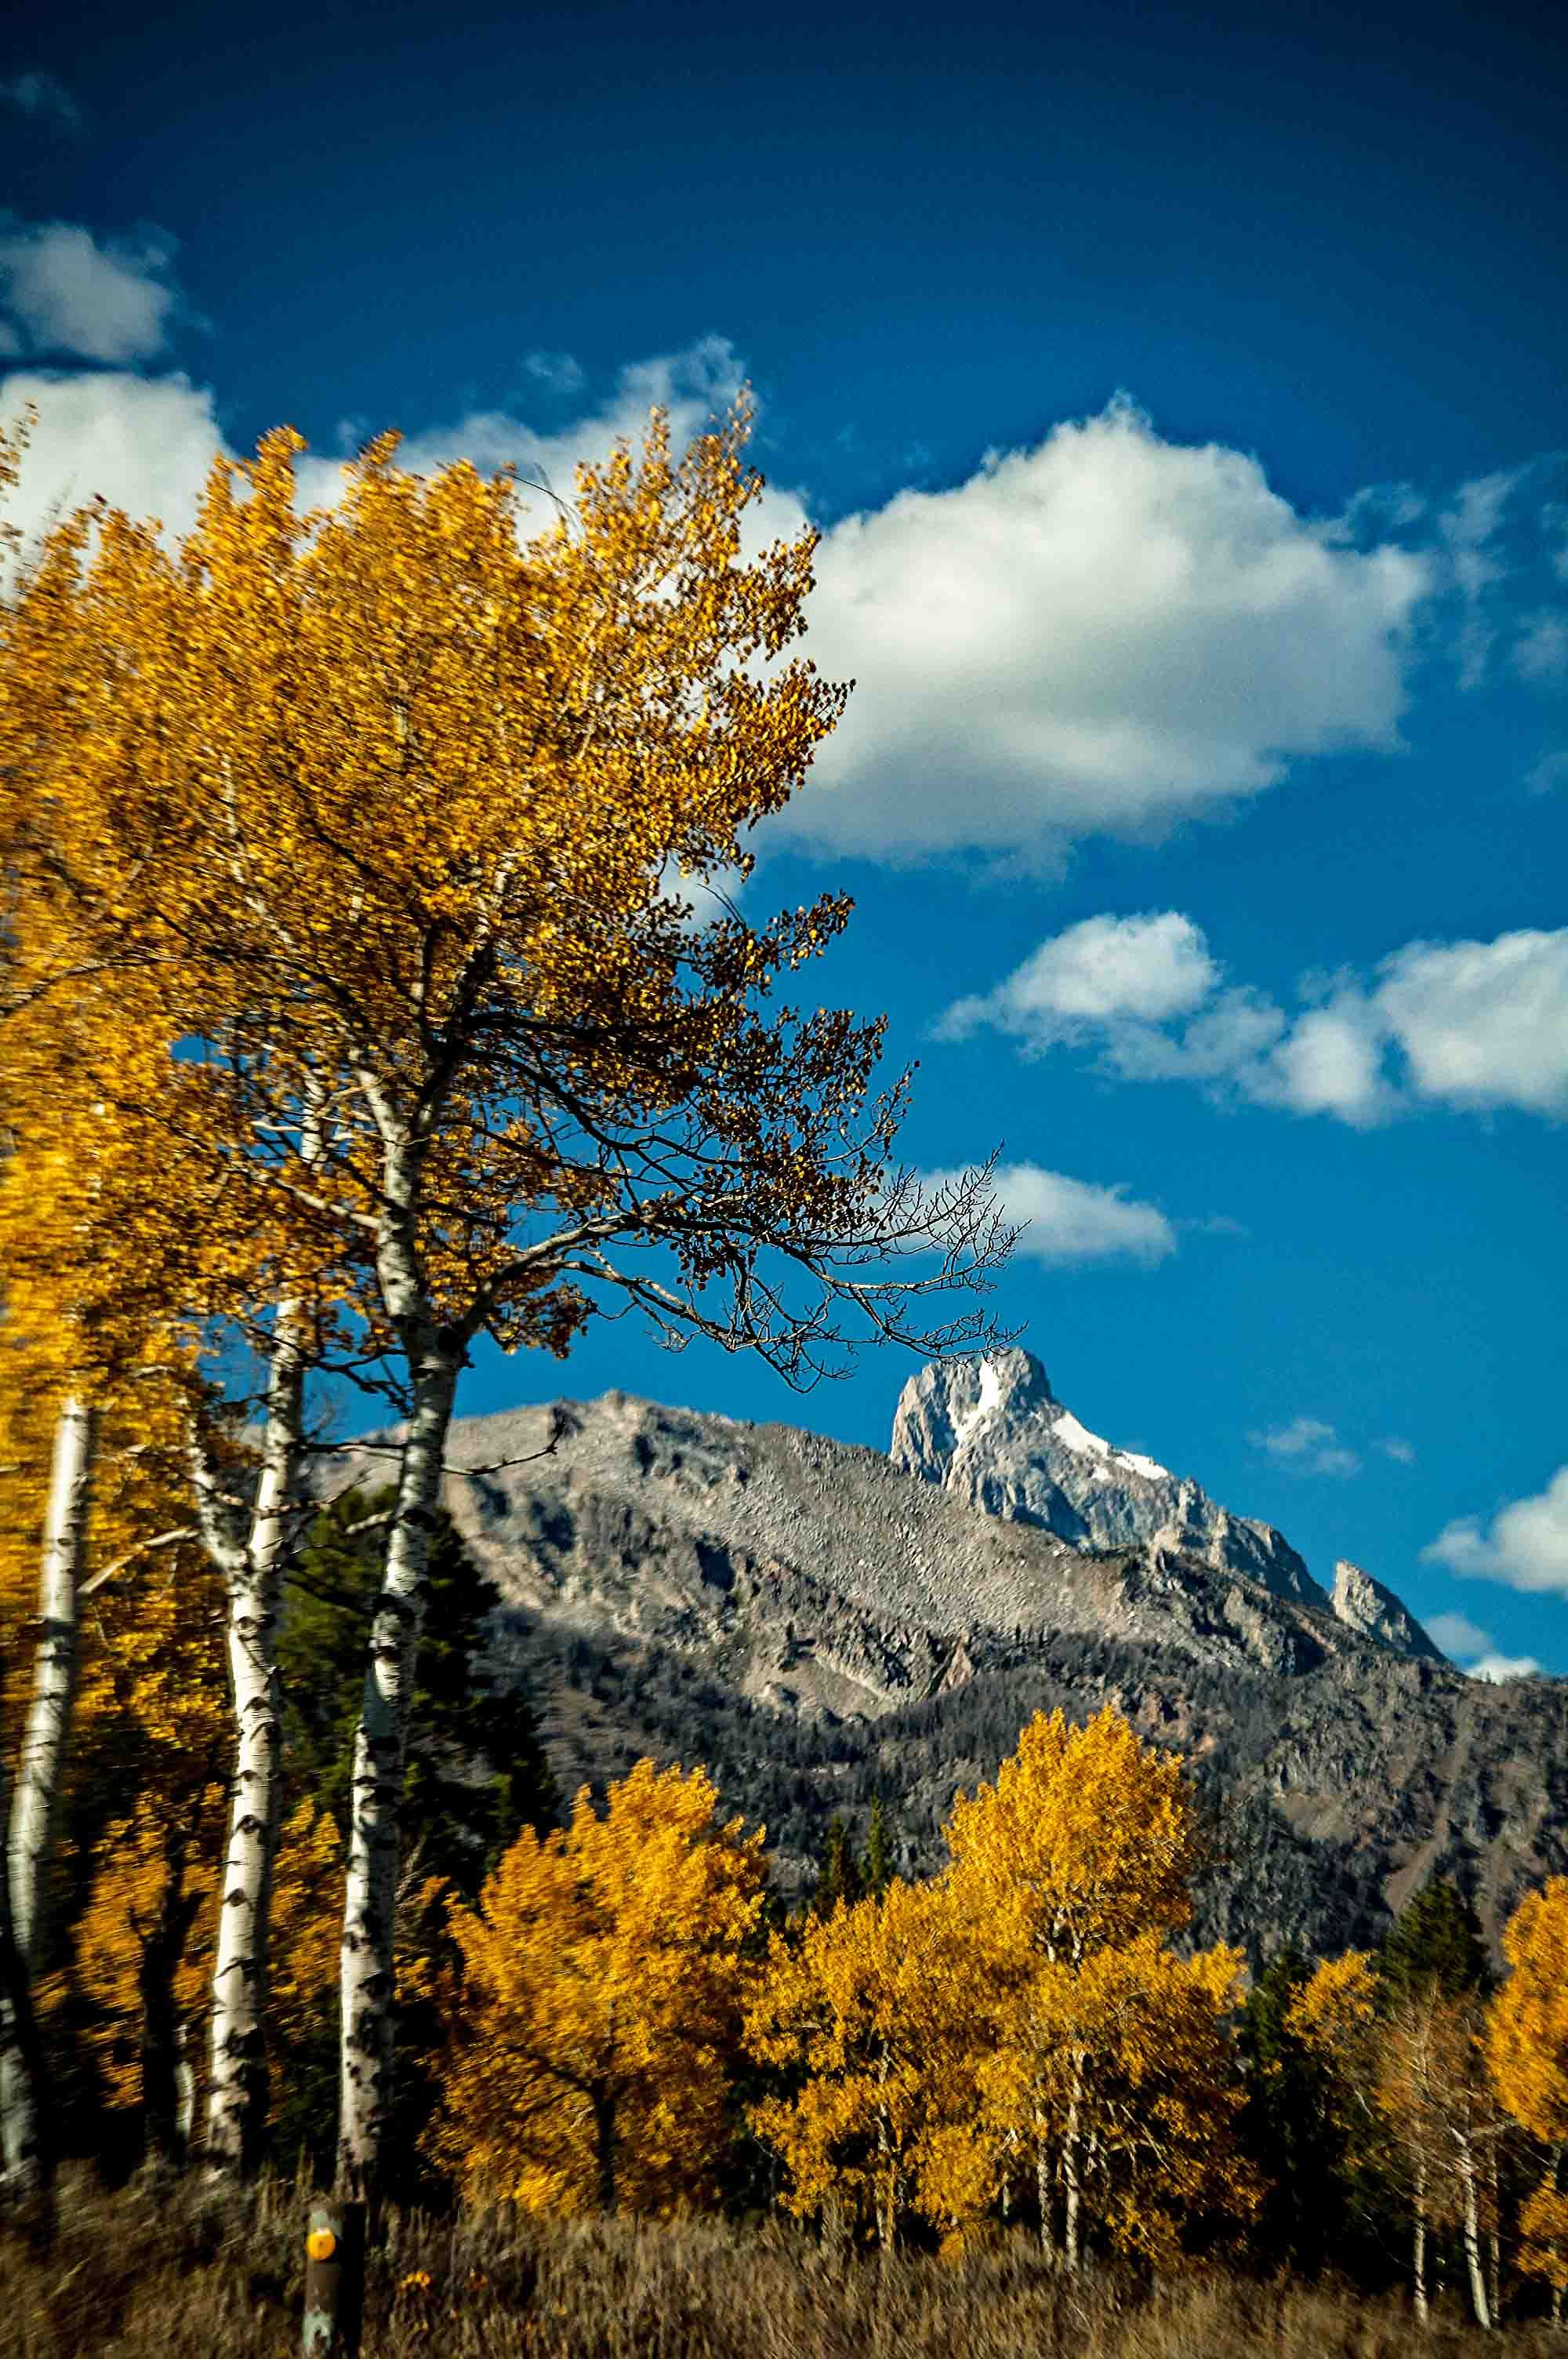 Aspens and the Tetons Tetons, State parks, Natural landmarks